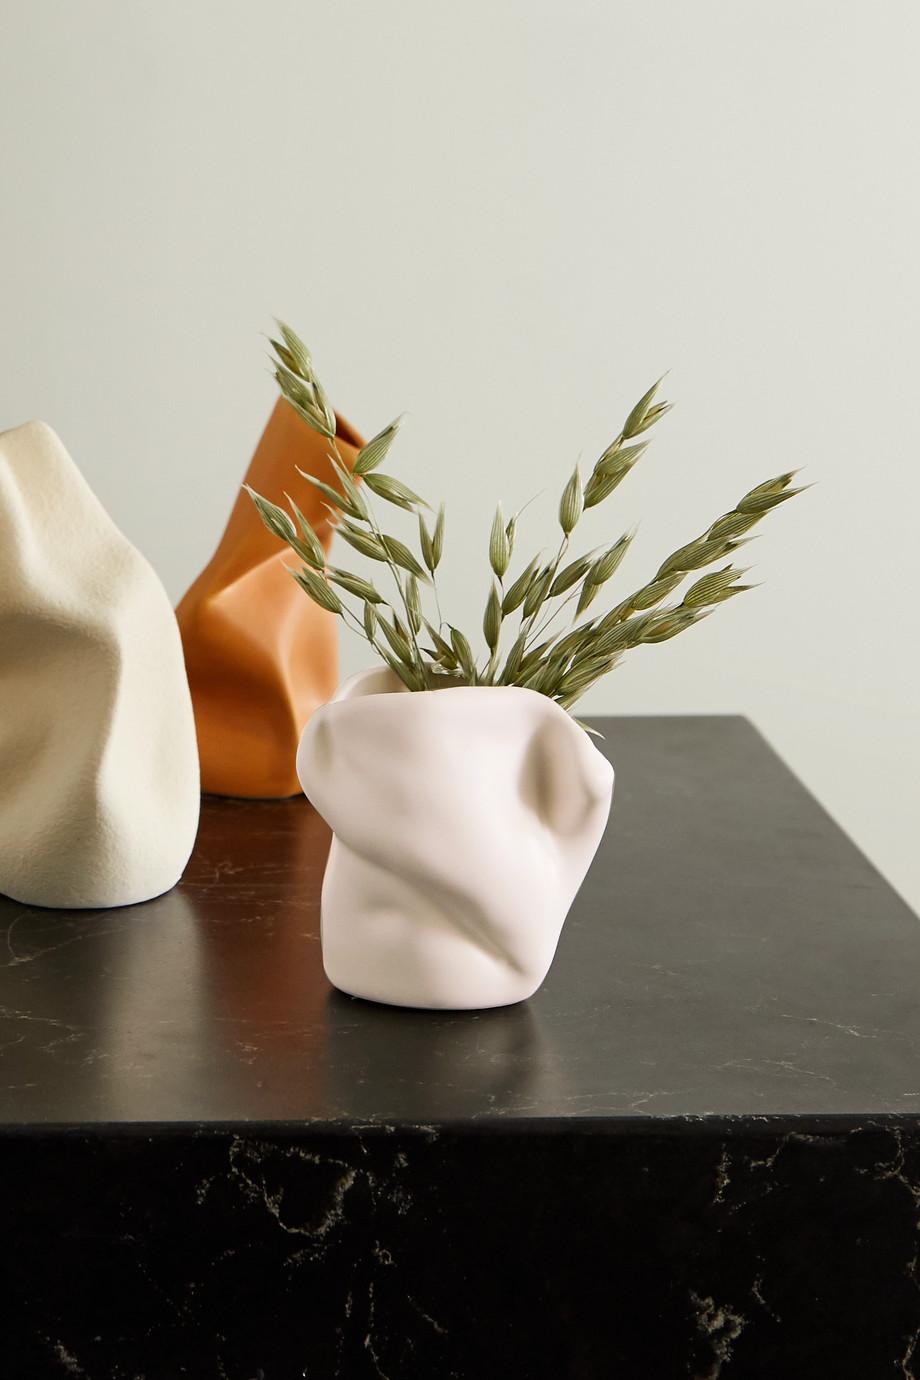 Completedworks + Ekaterina Bazhenova Yamasaki Postures – Kleine Keramikvase